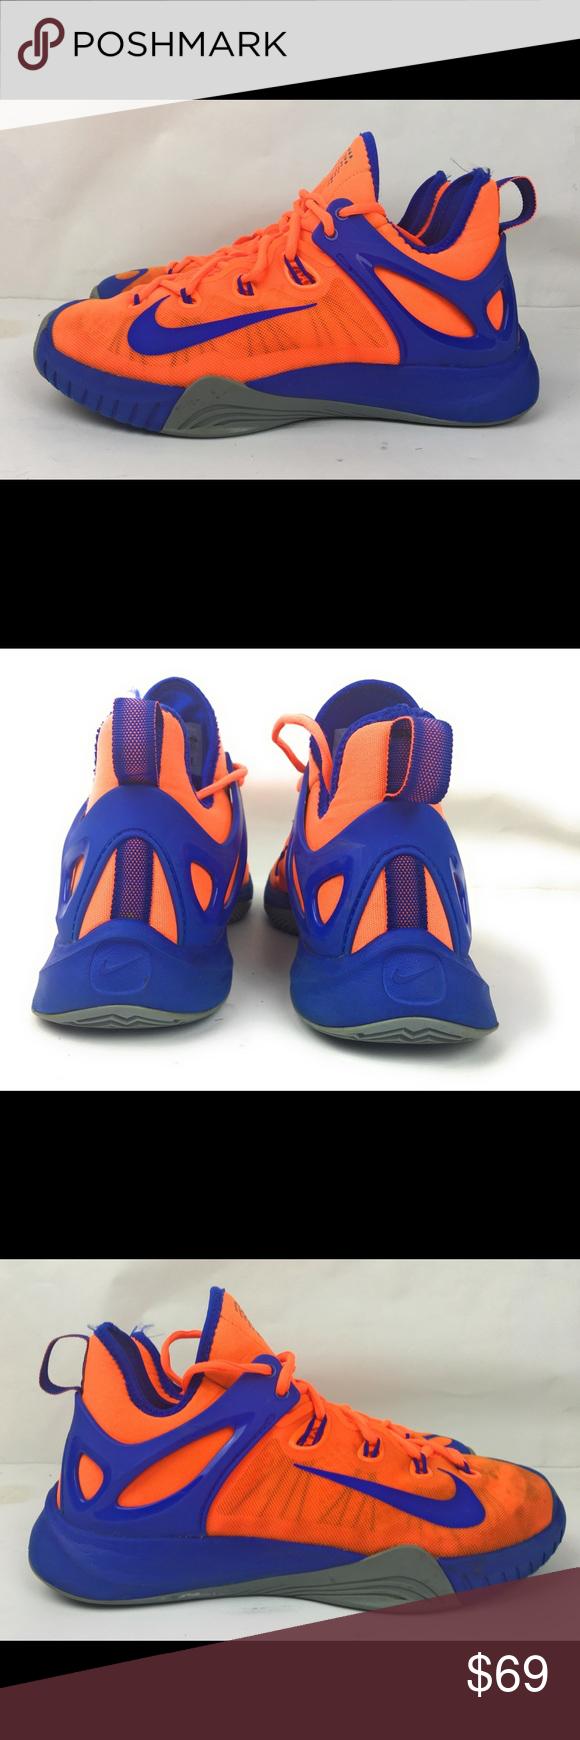 best sneakers 2ae41 68745 Nike Zoom HyperRev 2015 🍊 Blue Basketball Shoes Nike Zoom HyperRev 2015  Total Orange Dove Grey Men s Basketball Shoes 705370-840 Men s 8.5 US  Excellent ...